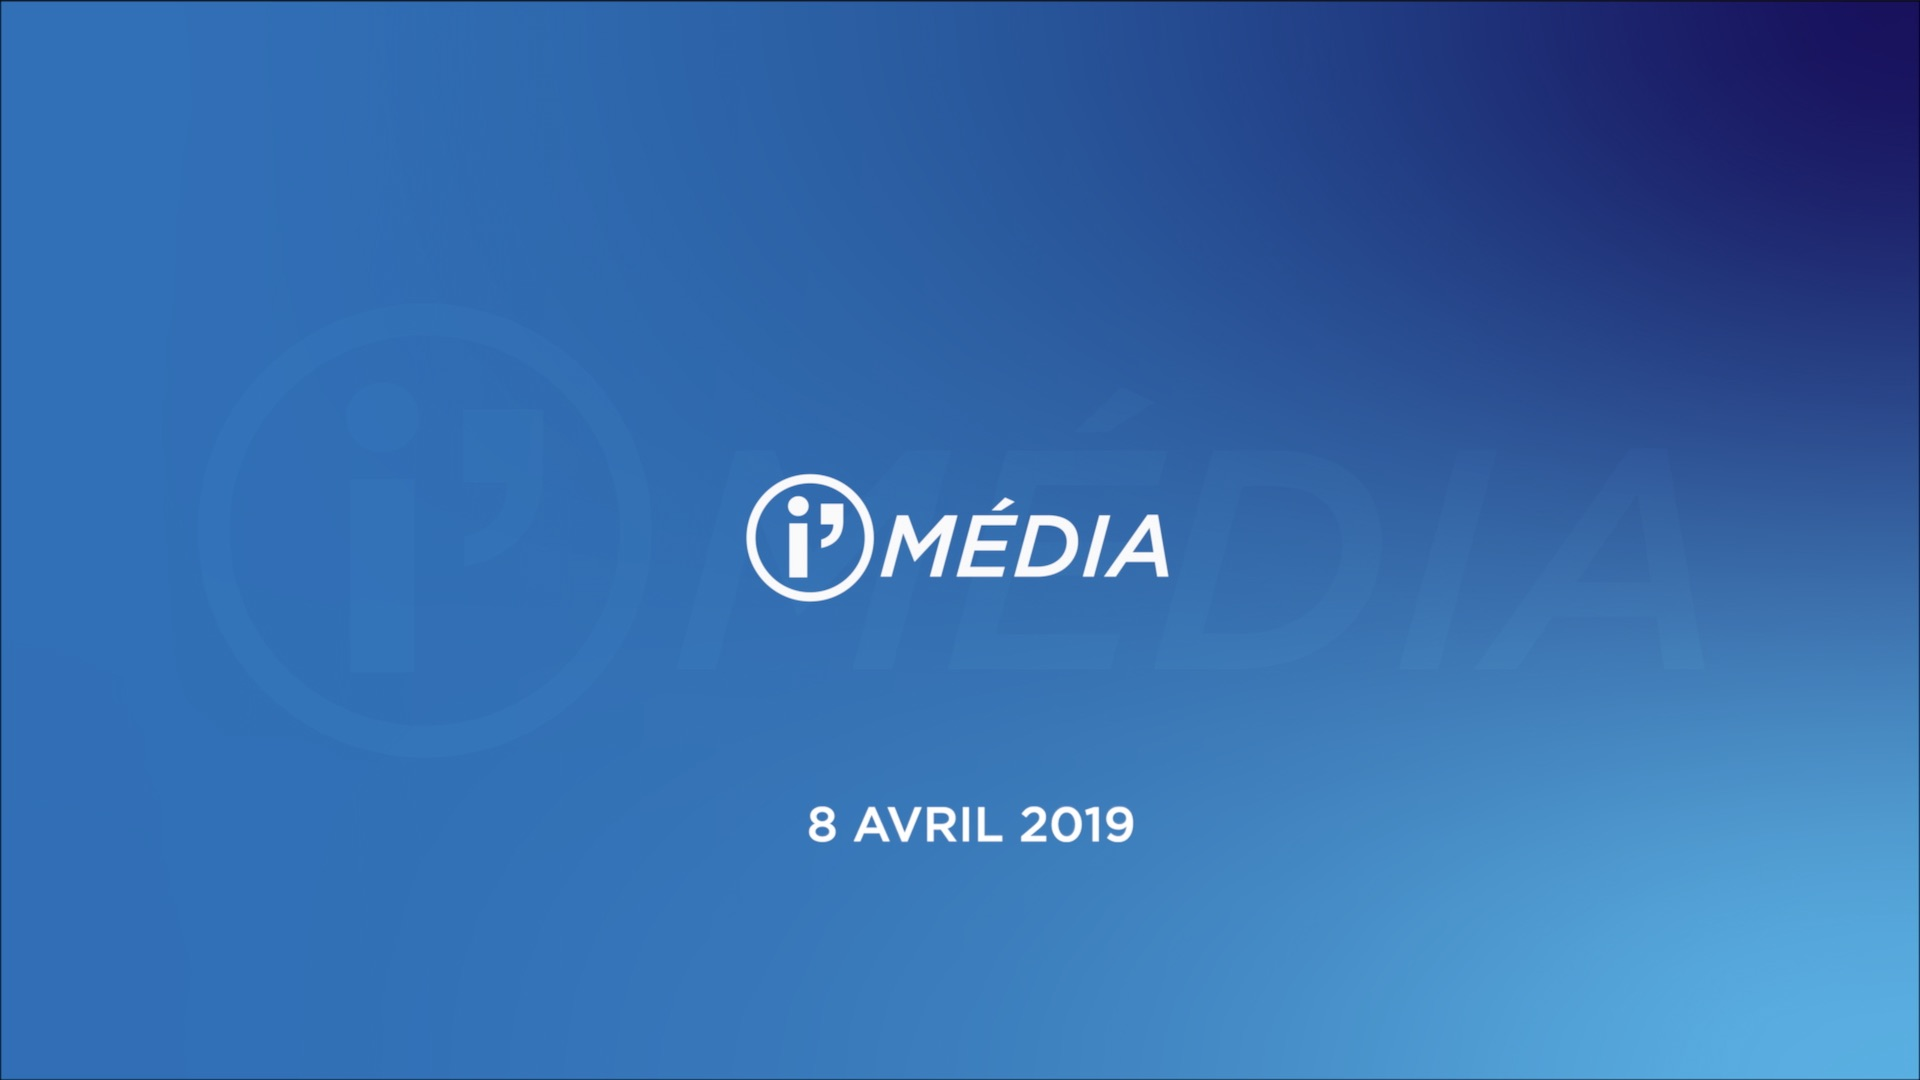 I'Média 8 avril 2019